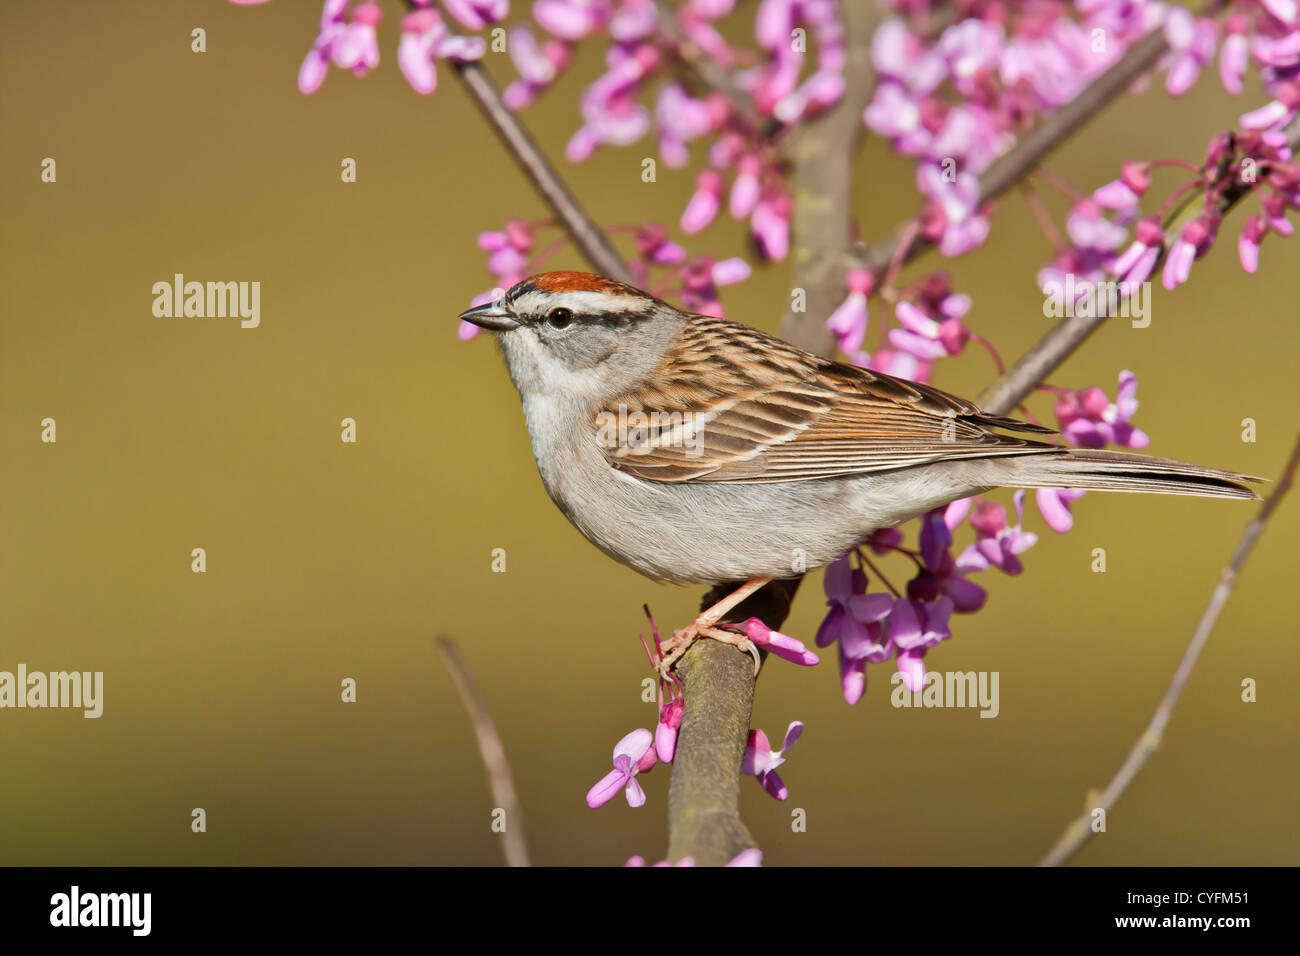 Chipping Sparrow, Spizella passerina - Stock Image